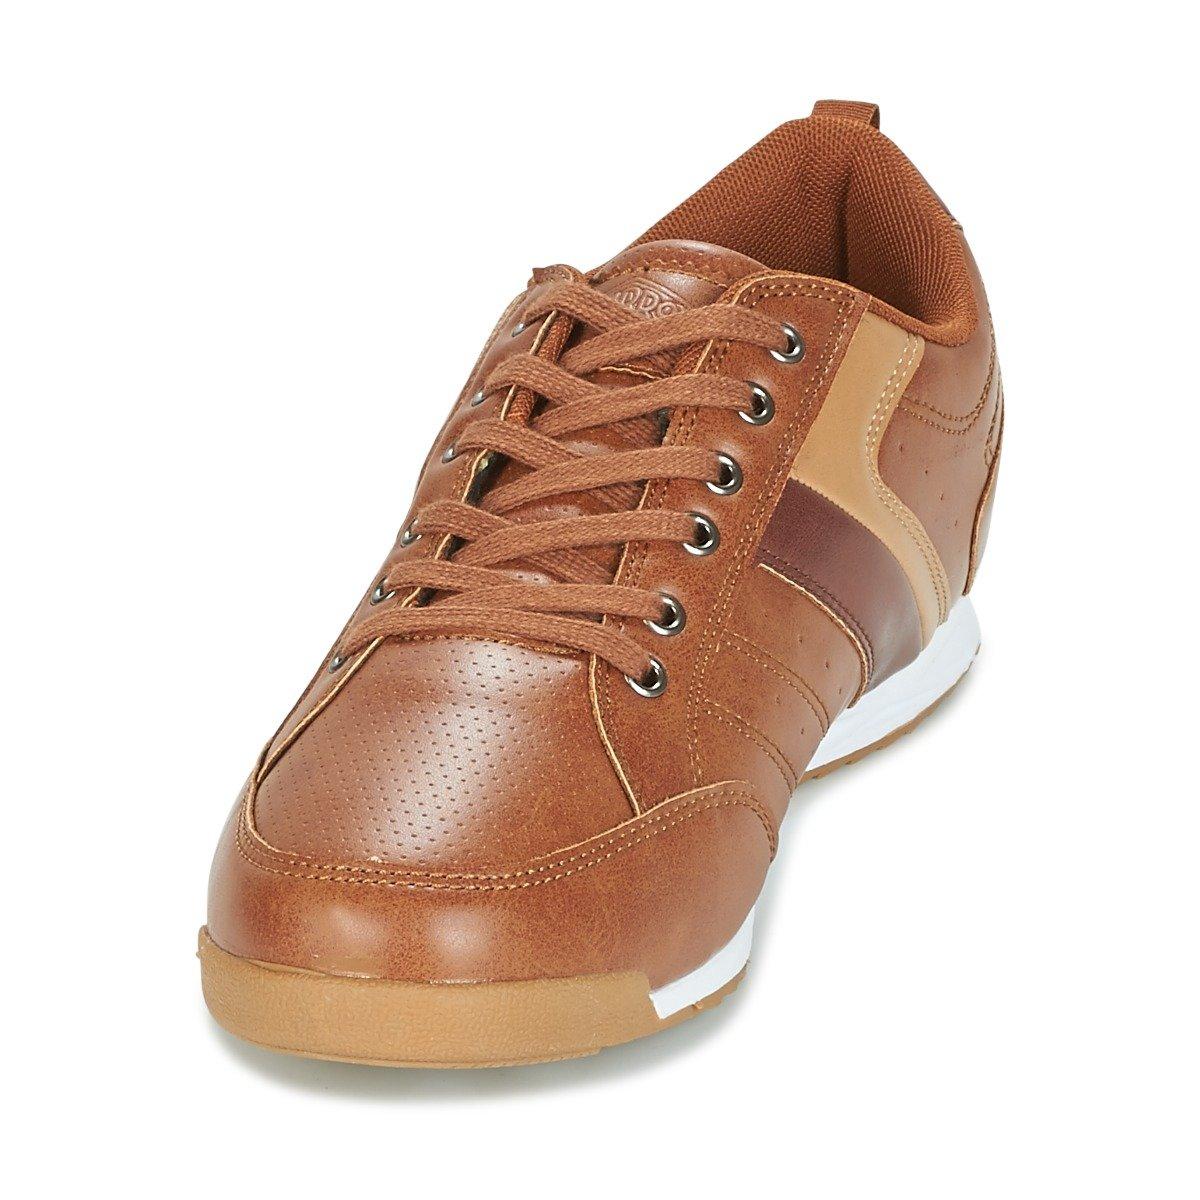 HommeEt Marron Sacs Chaussures Ecton Umbro rBCedox